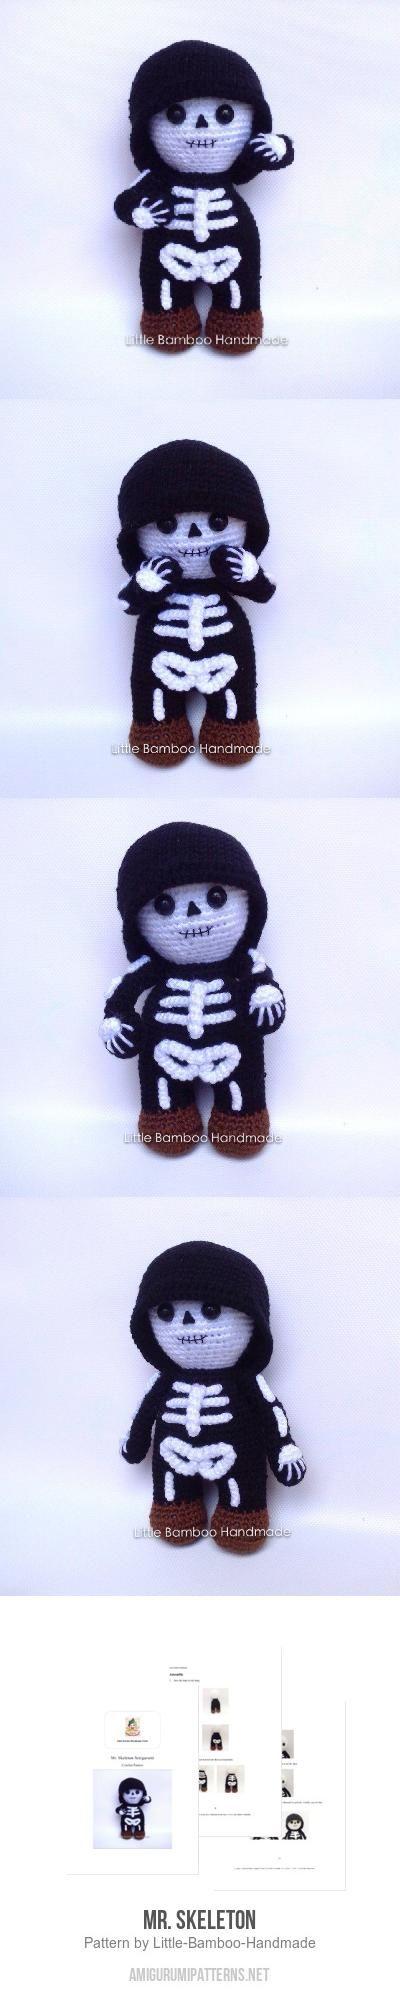 Skeleton Crochet Amigurumi Pattern | Etsy | 1996x400